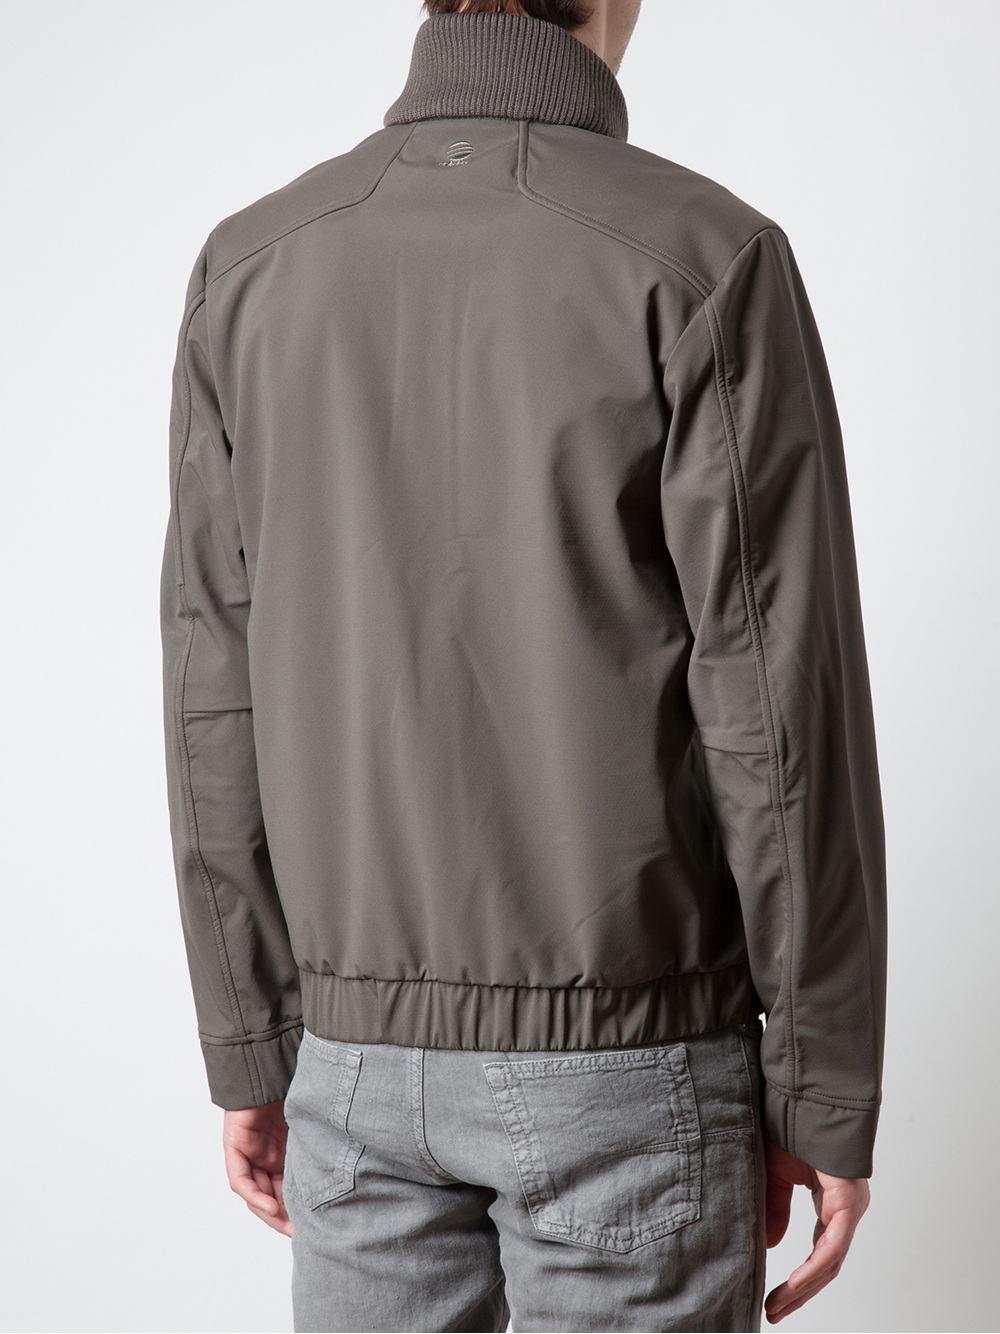 7e950bf20 Porsche Design Techno Driving Jacket in Gray for Men - Lyst